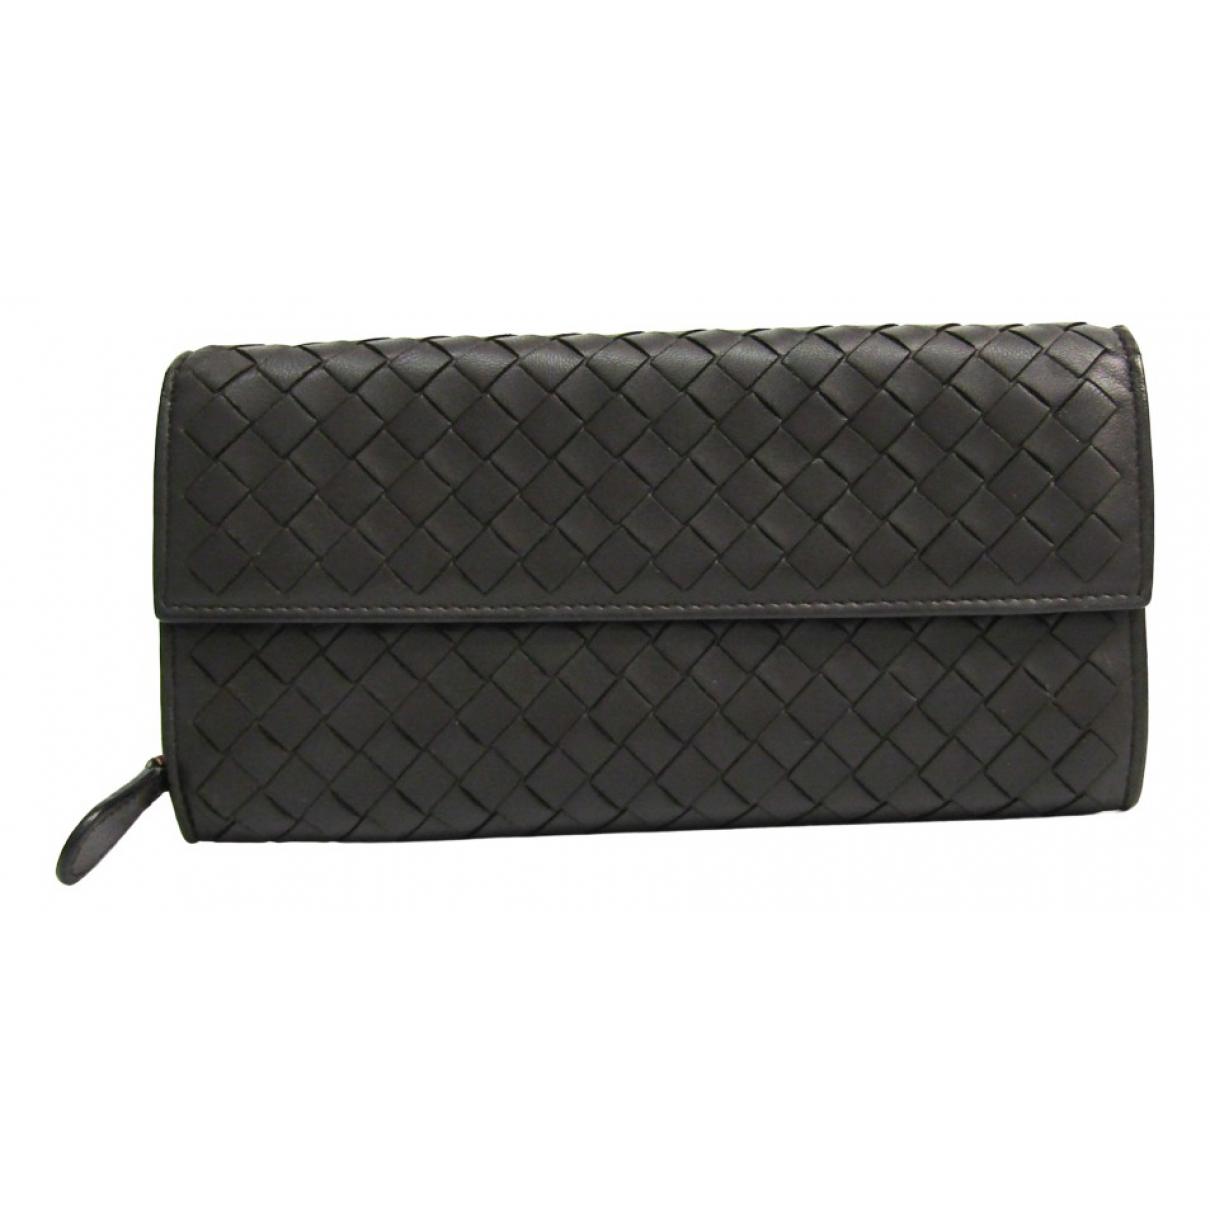 Bottega Veneta Intrecciato Brown Leather wallet for Women N